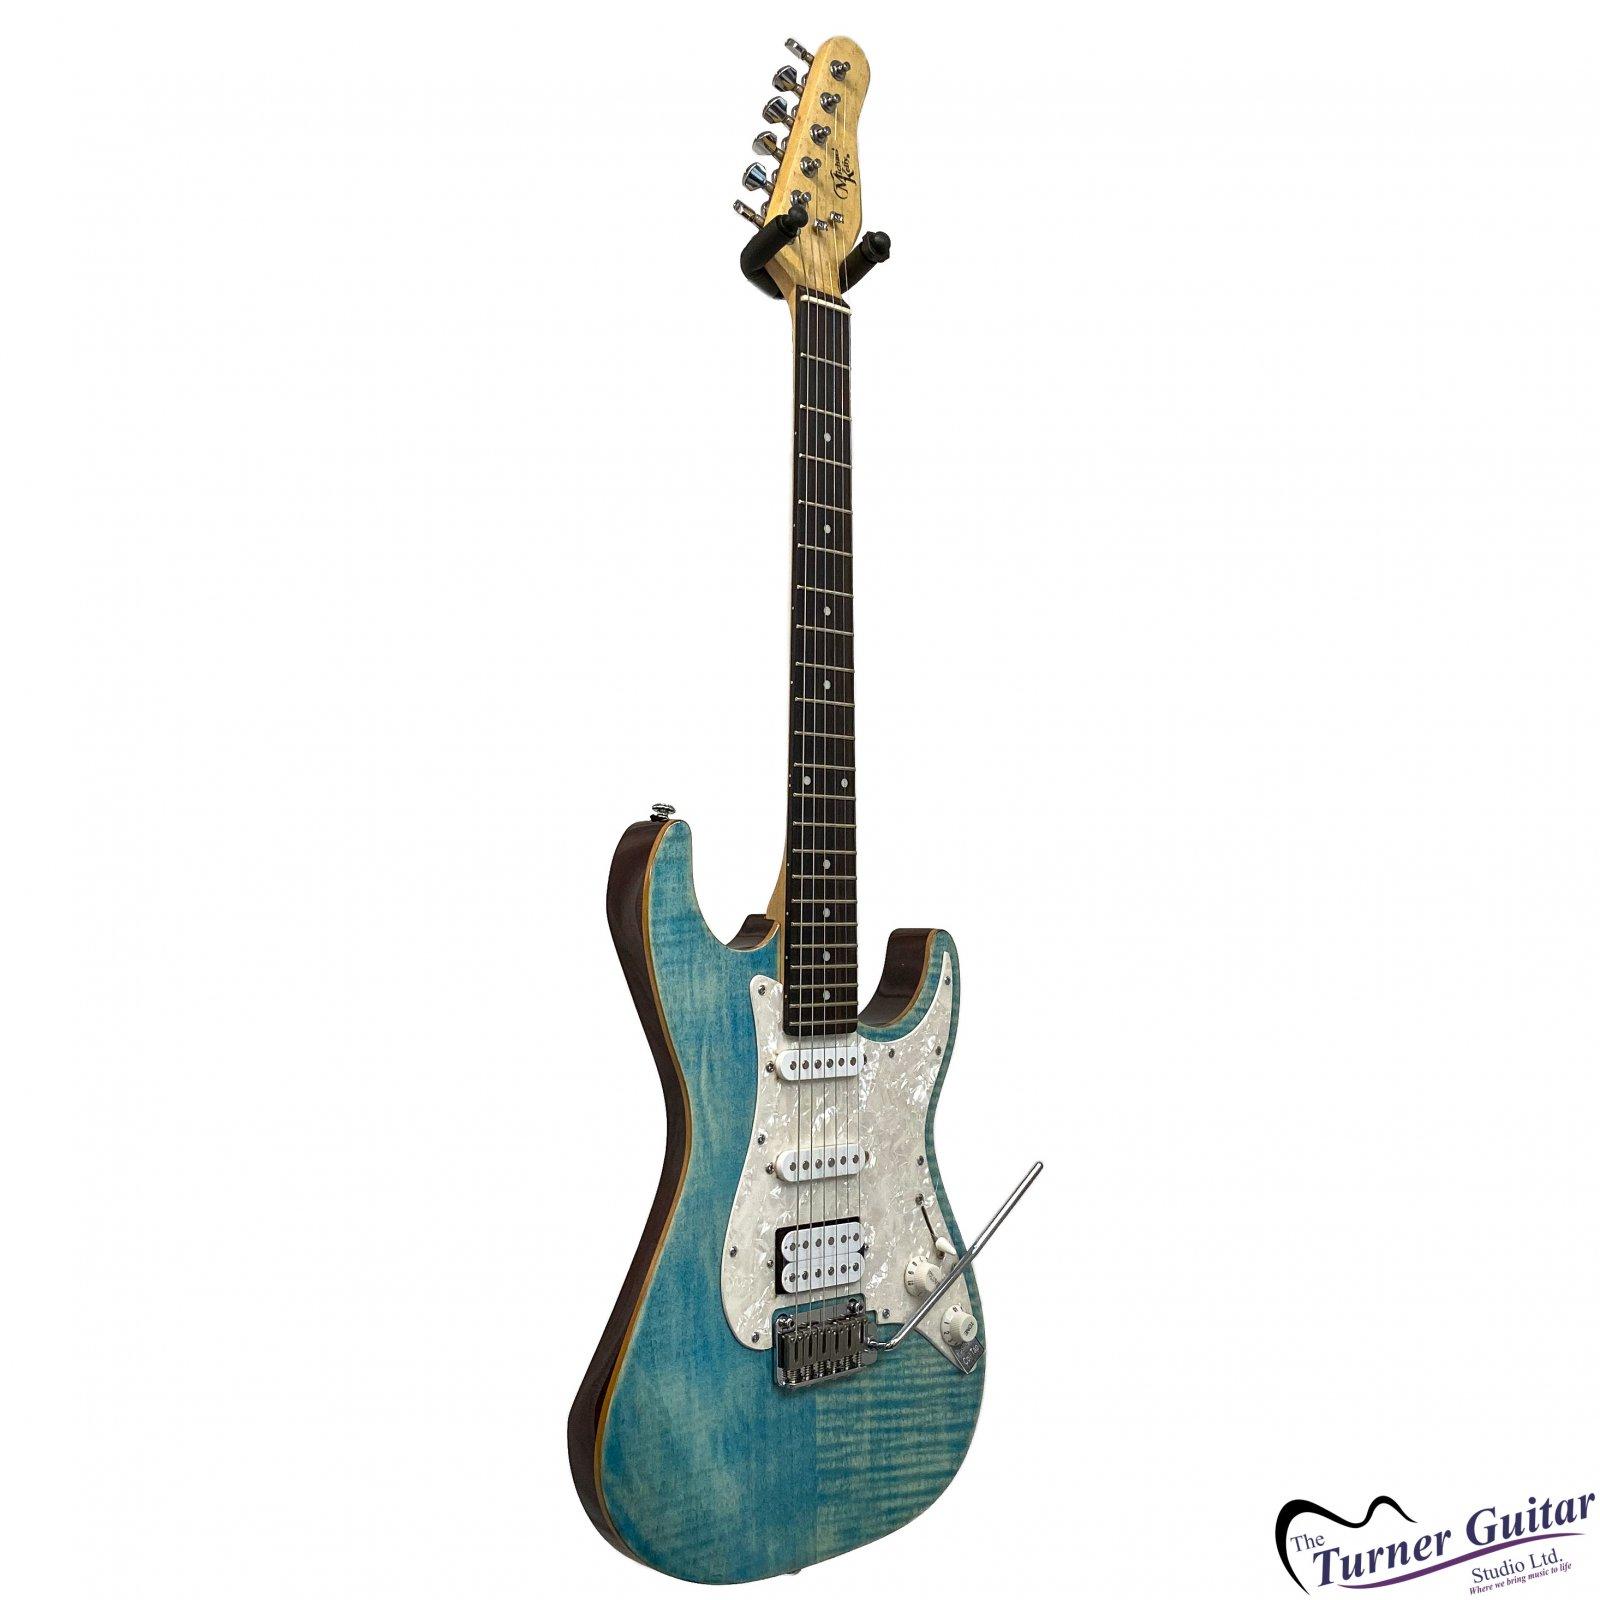 Michael Kelly 1963 HSS Electric - Blue Jean Wash